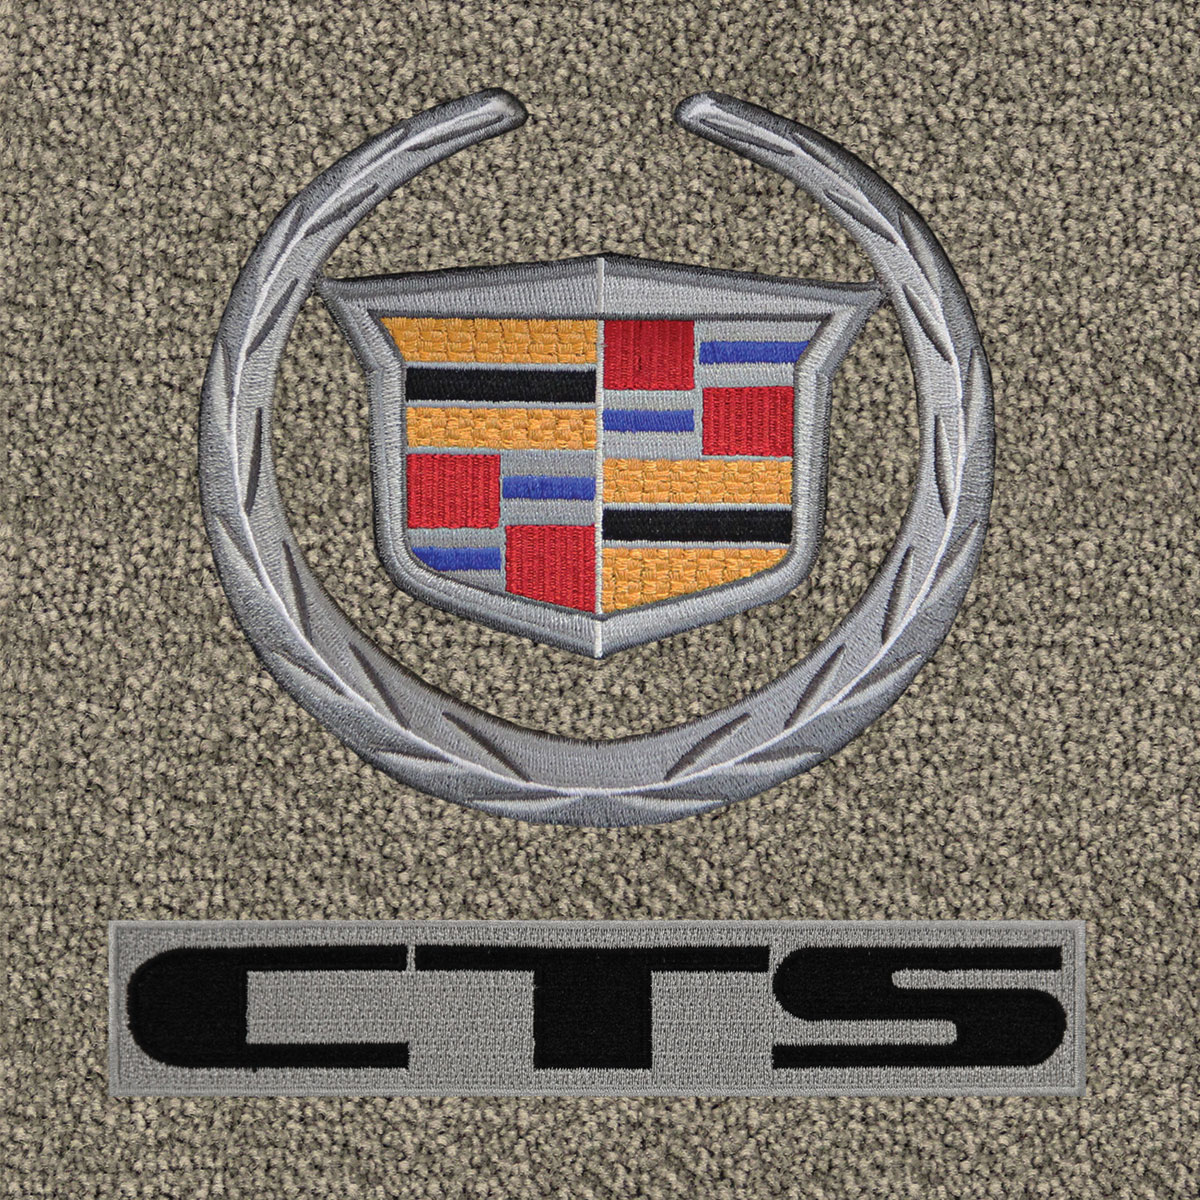 Cadillac Cts Floor Mats 2008